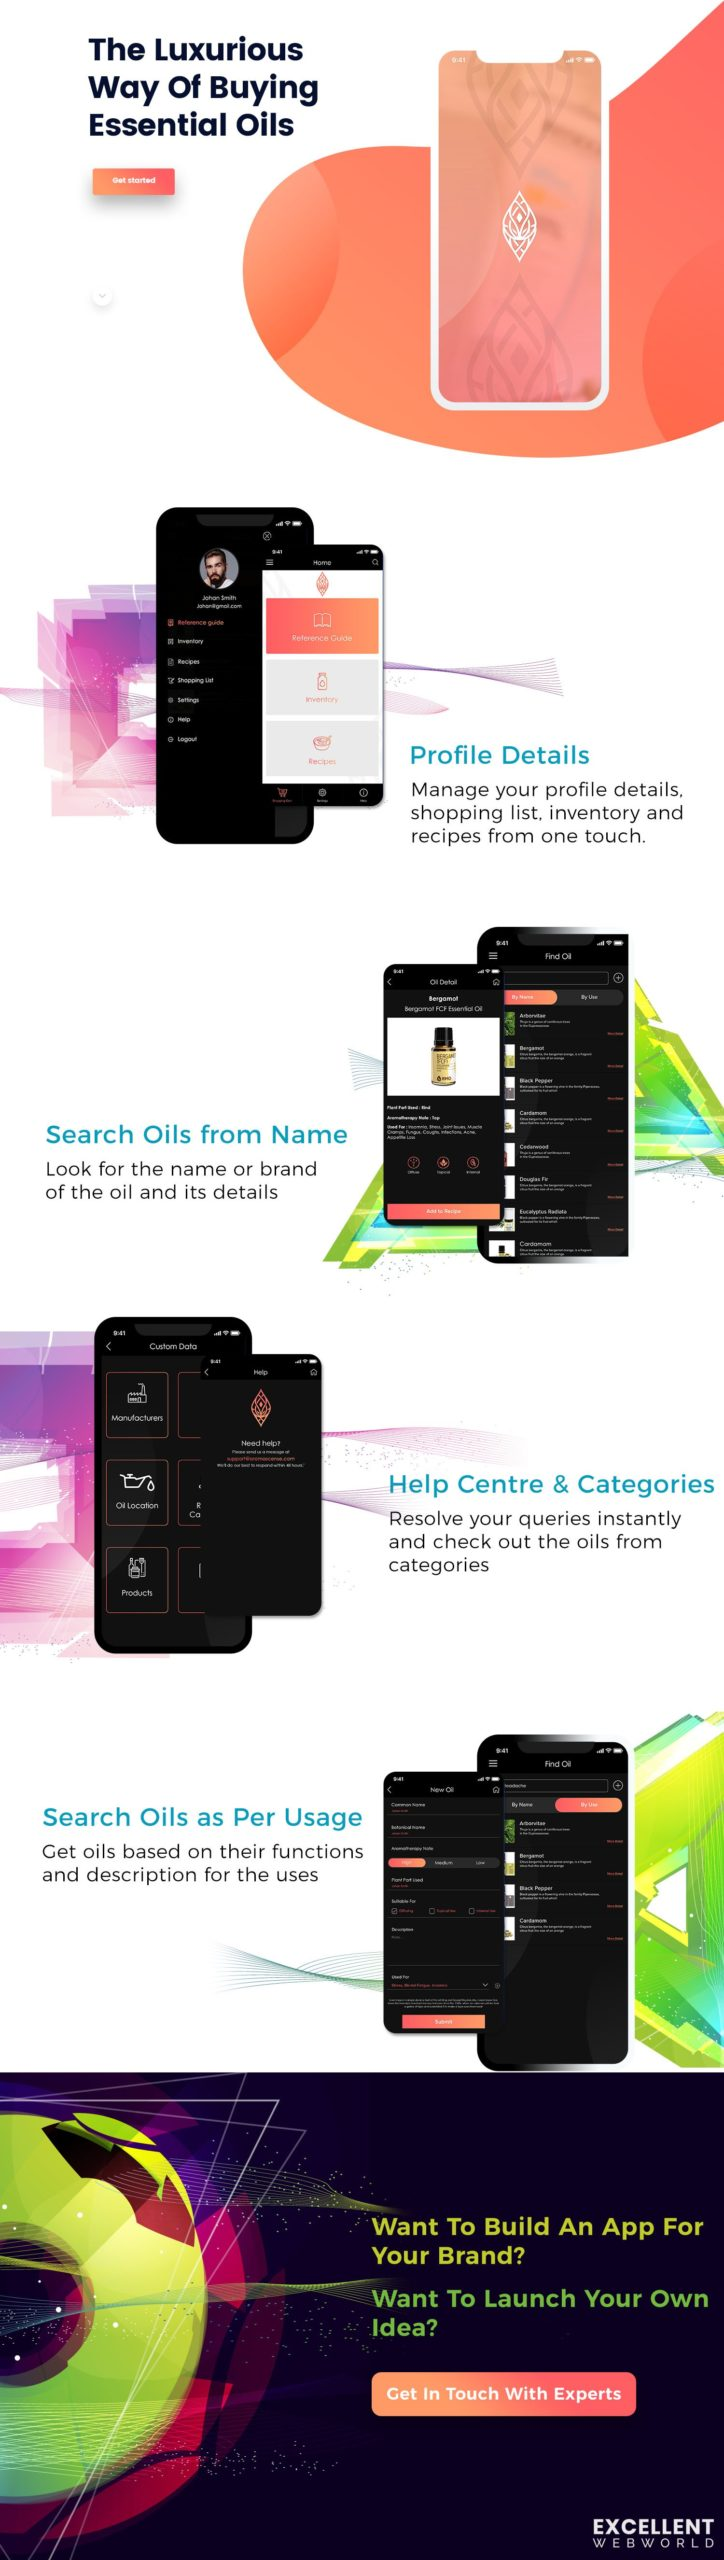 Essentials Oil App Development